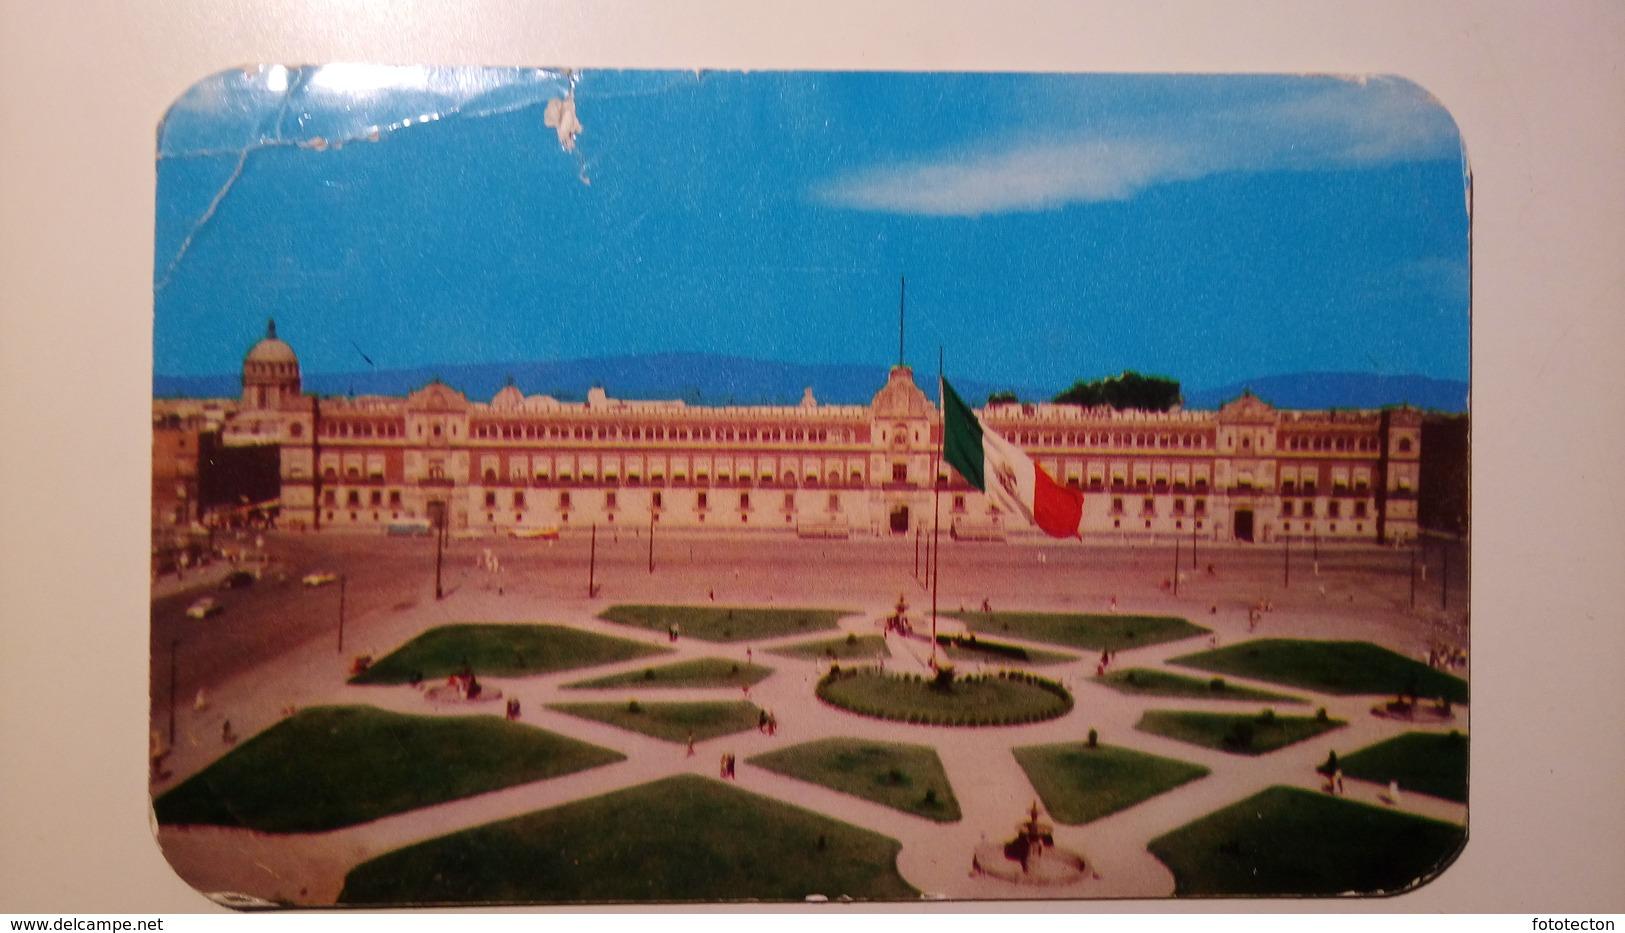 México - Ciudad De Mexico City - Palacio Nacional, Zocalo - Messico